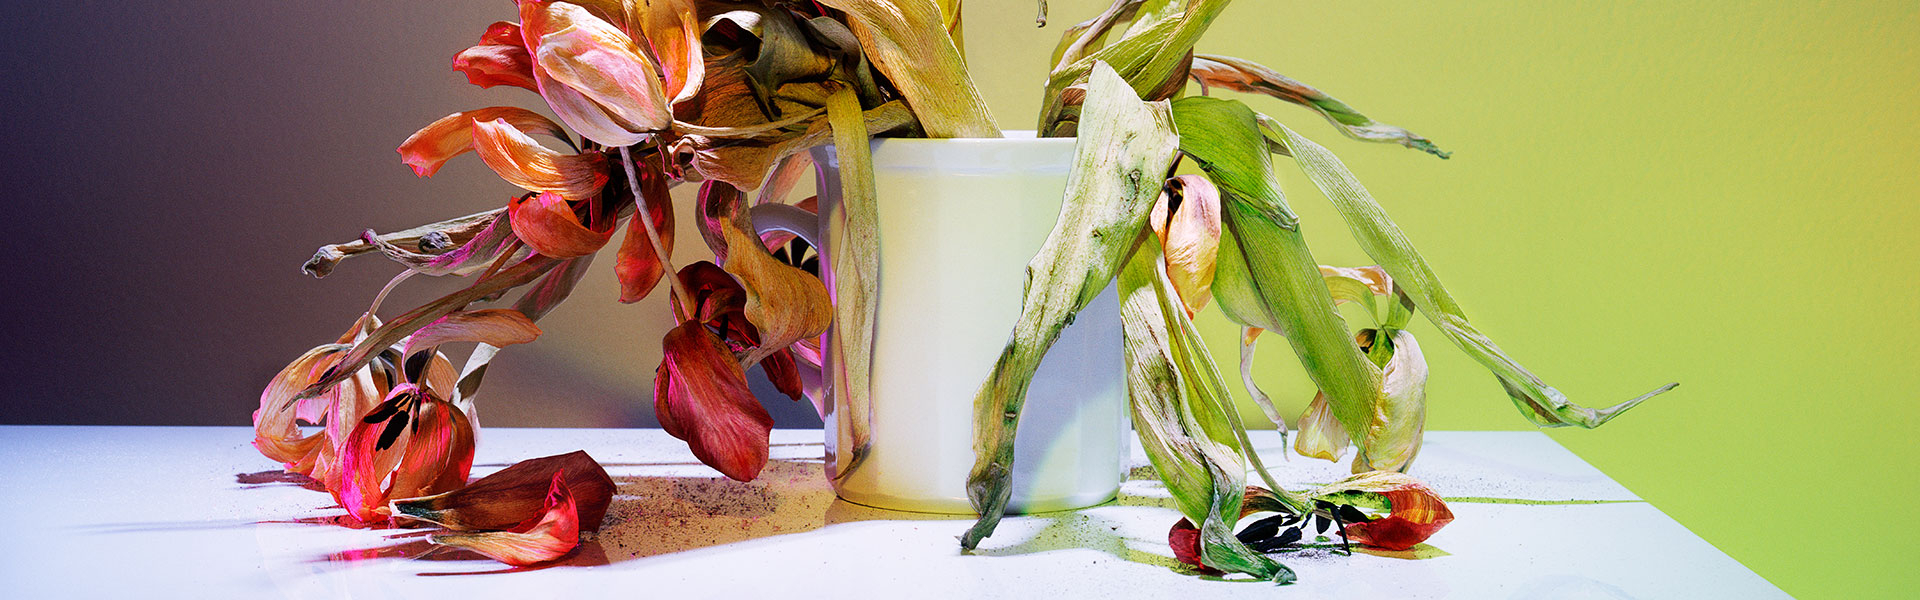 banner_tulips-Web-AmandaArcuri.20210601121209.jpg